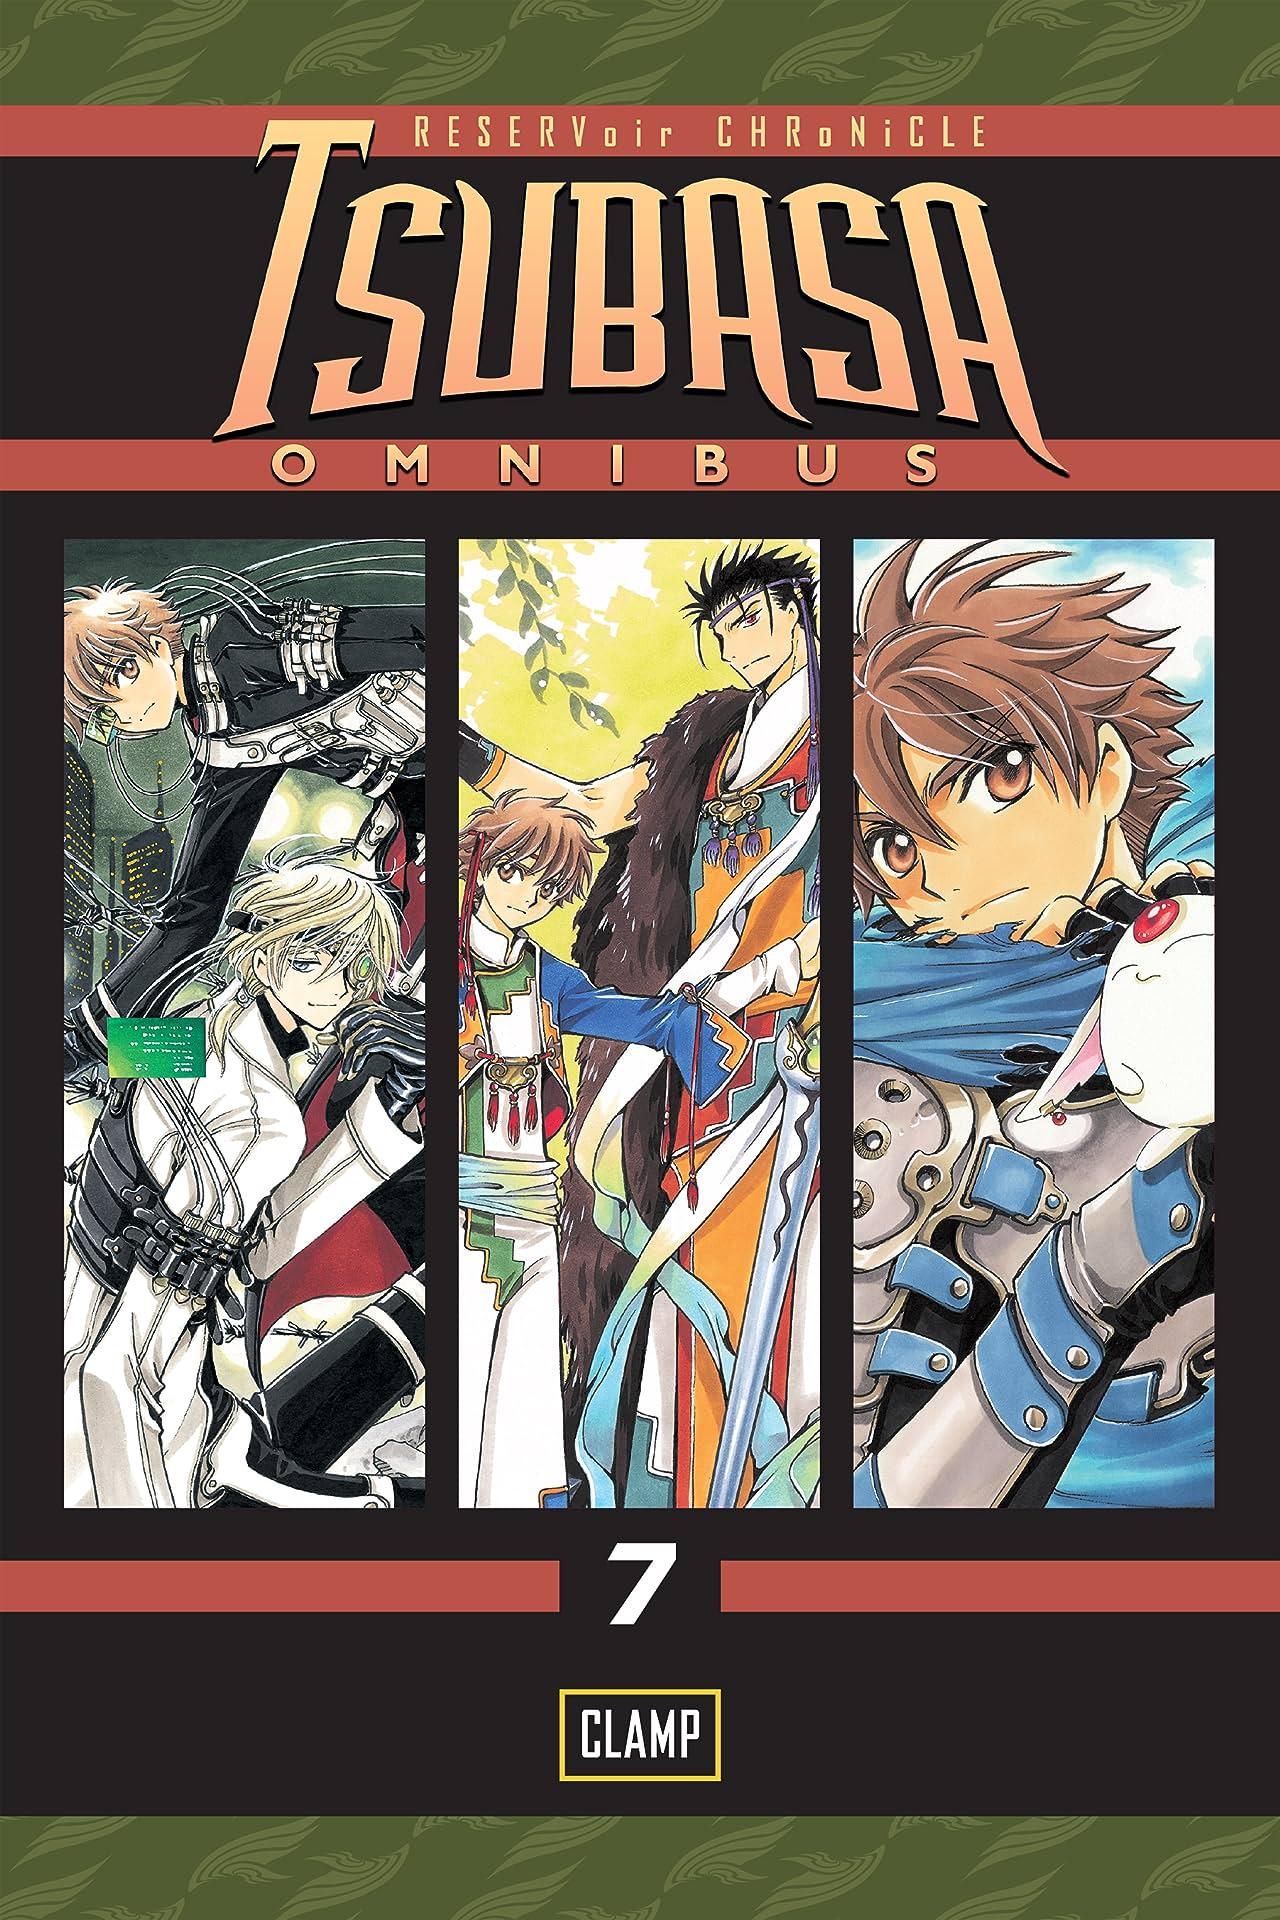 Tsubasa Omnibus Vol. 7